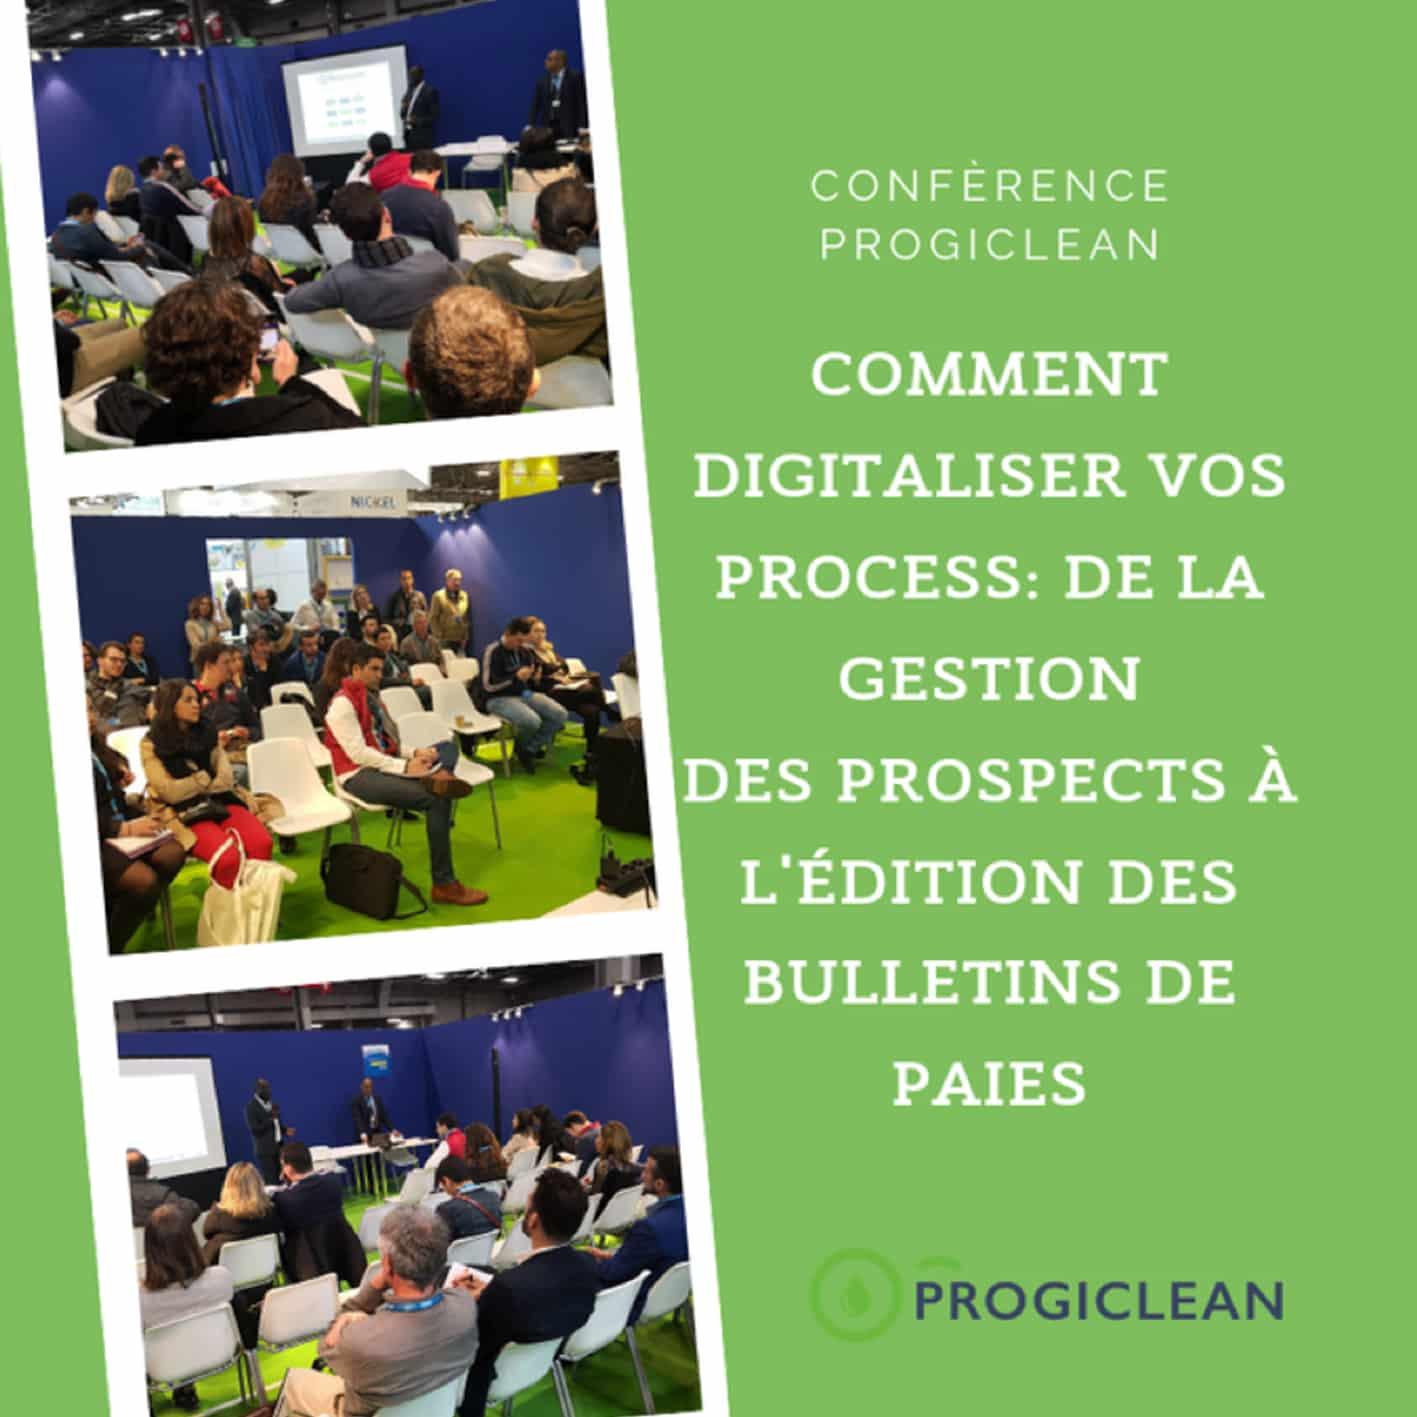 Conférence progiclean le 17/04 lors d'Europropre